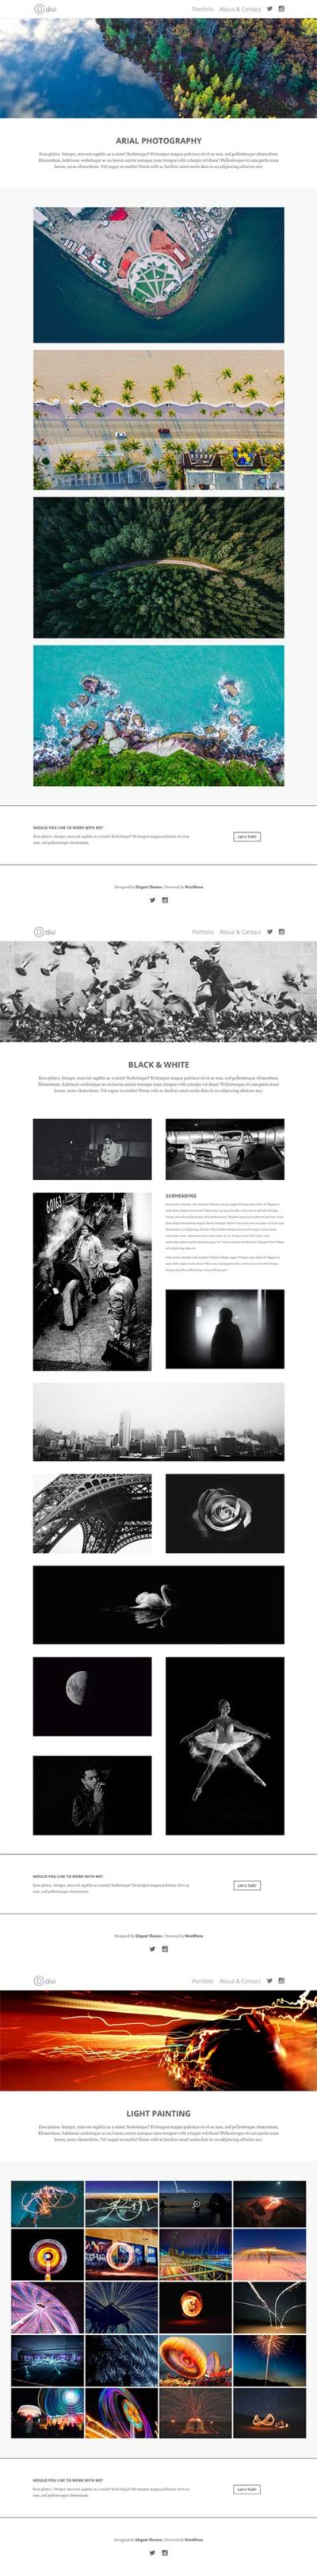 divi project layout pack